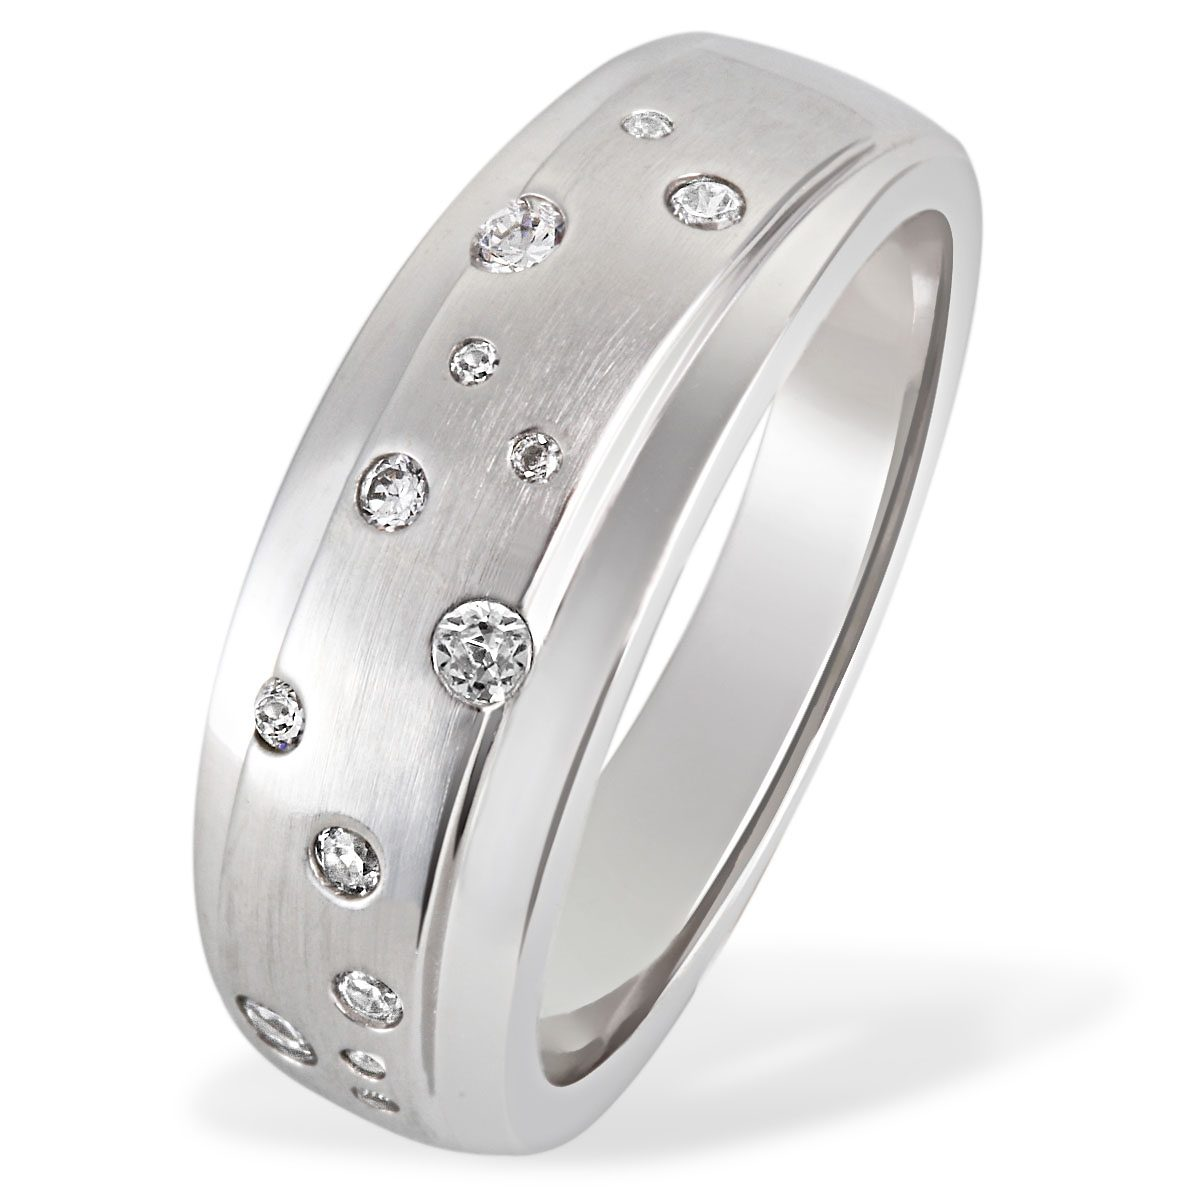 Averdin Damenring 925/- Silber 13 Zirkonia Sternenhimmel